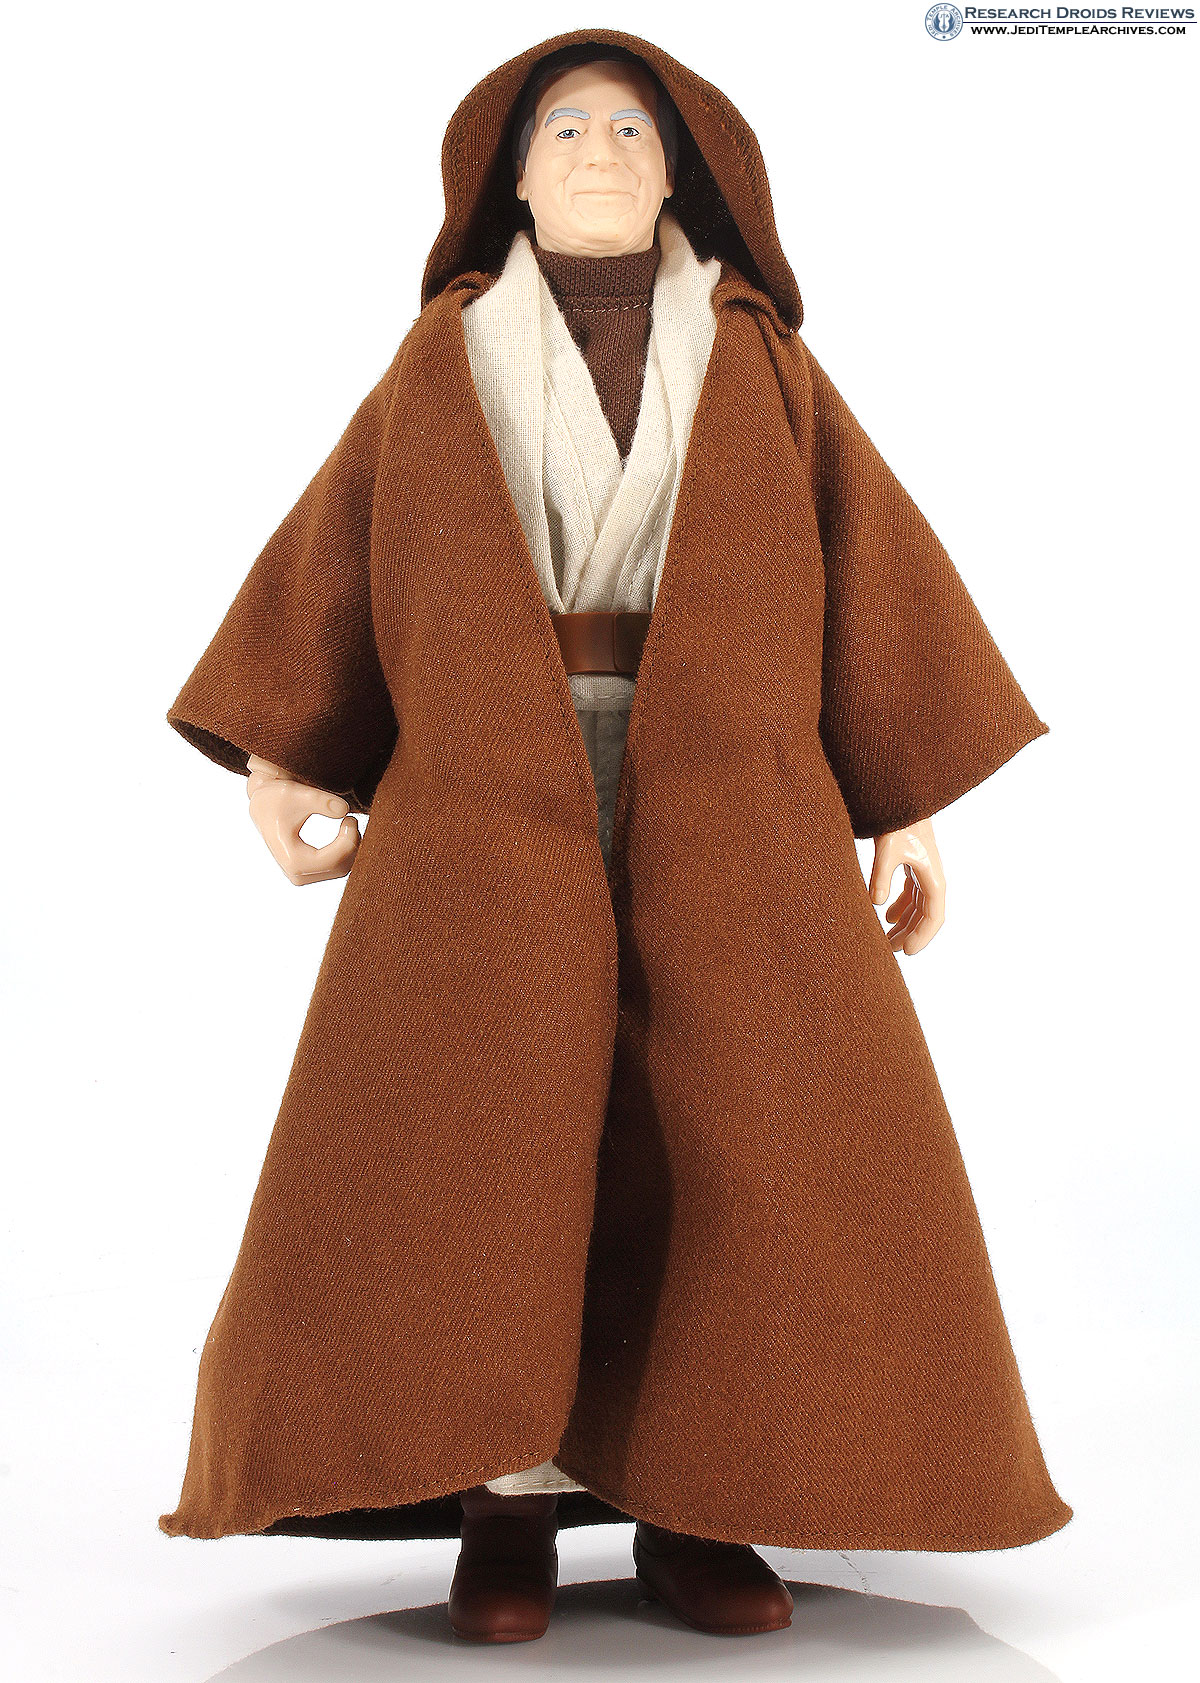 Anakin Skywalker - The Story of Darth Vader